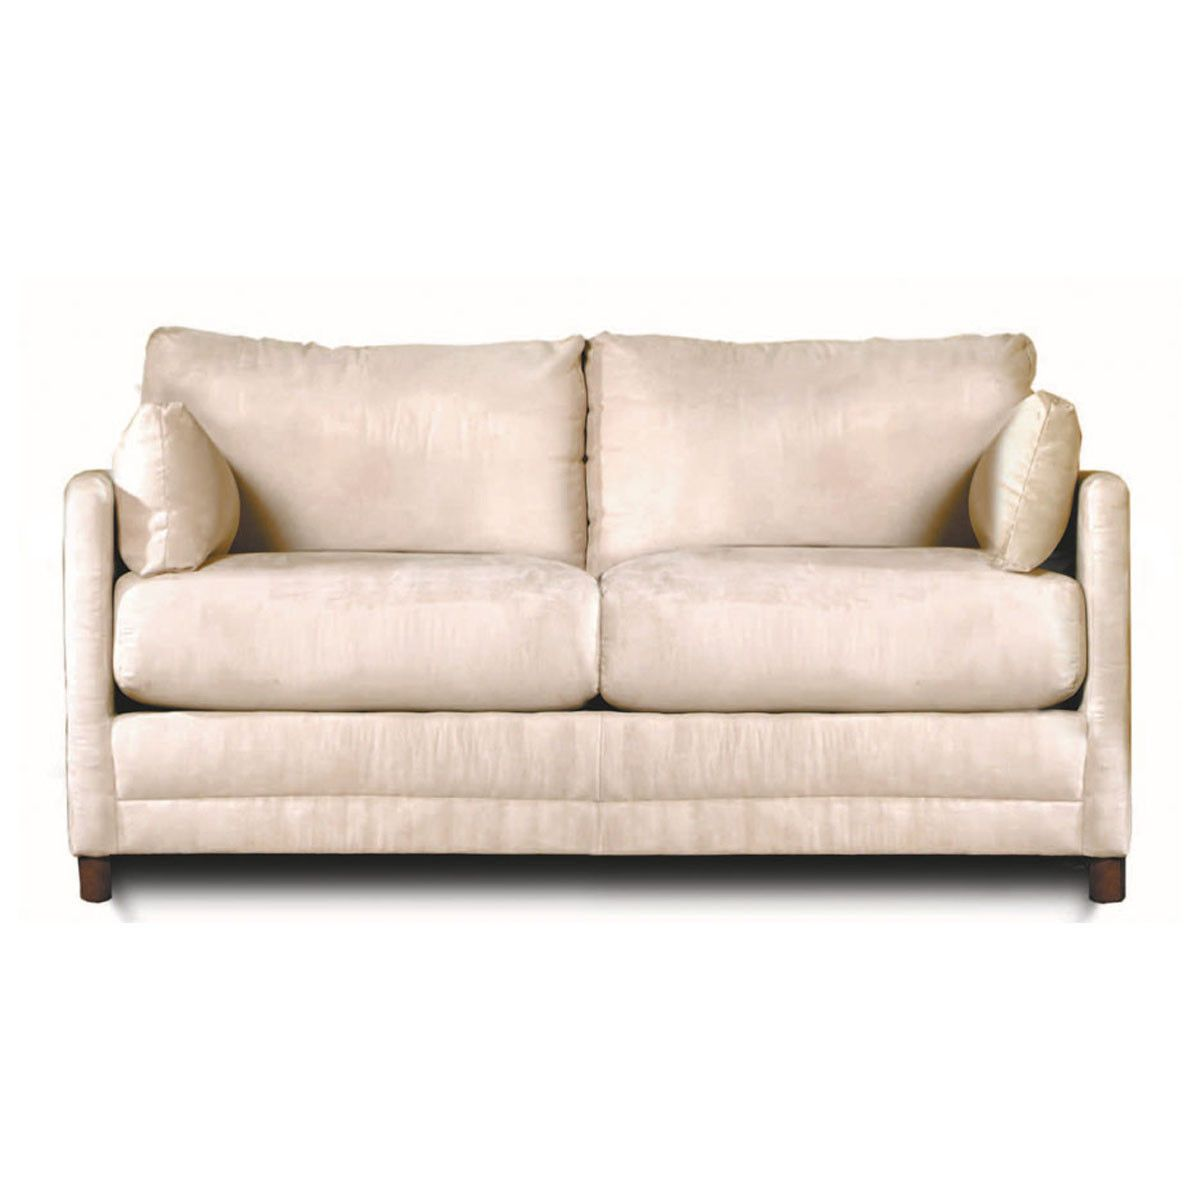 Softee Full Sleeper Sofa Sleeper sofas Full sleeper sofa and